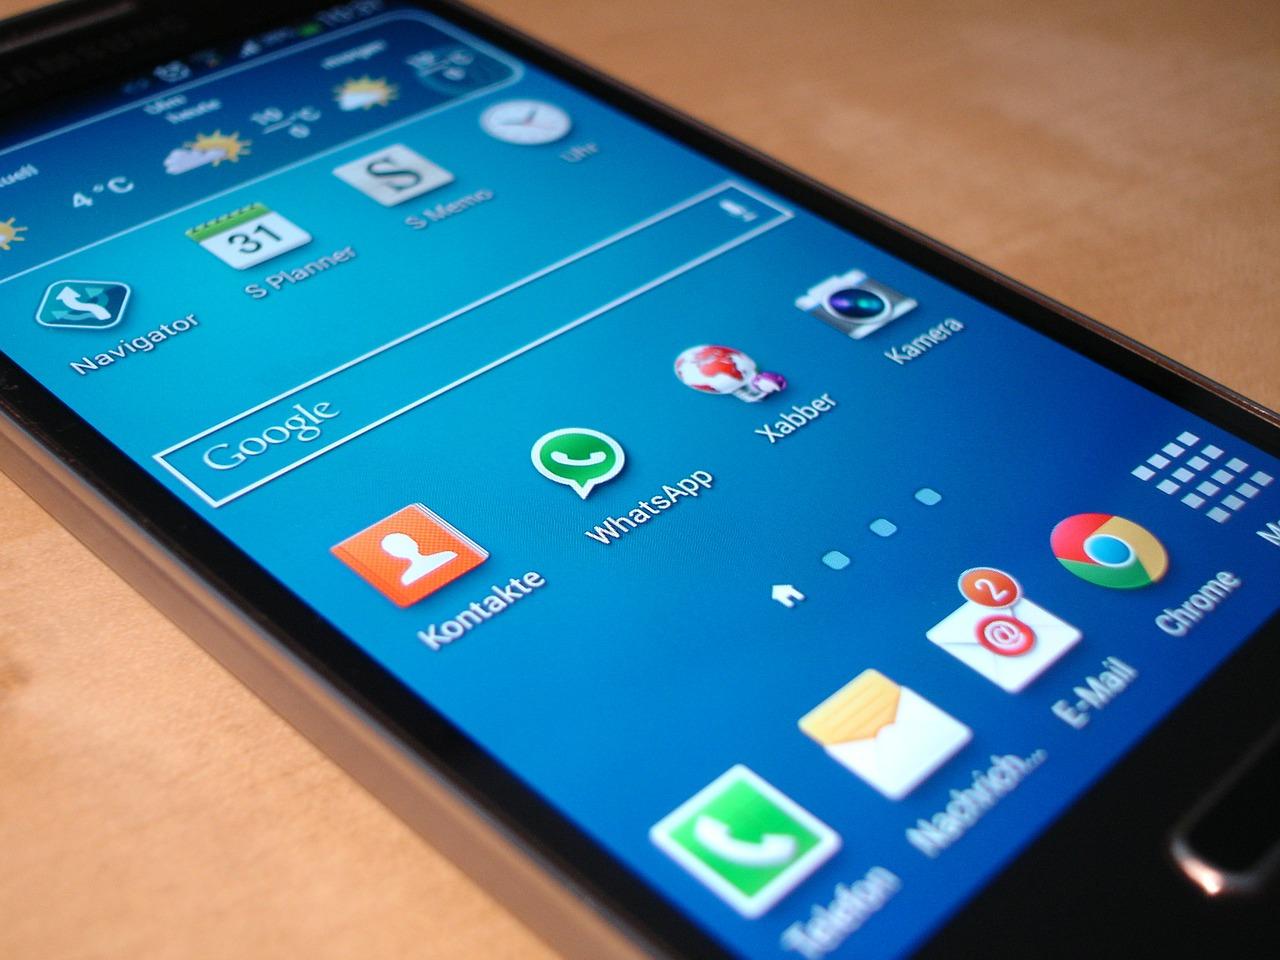 Android Bug Kamera Hintergrund